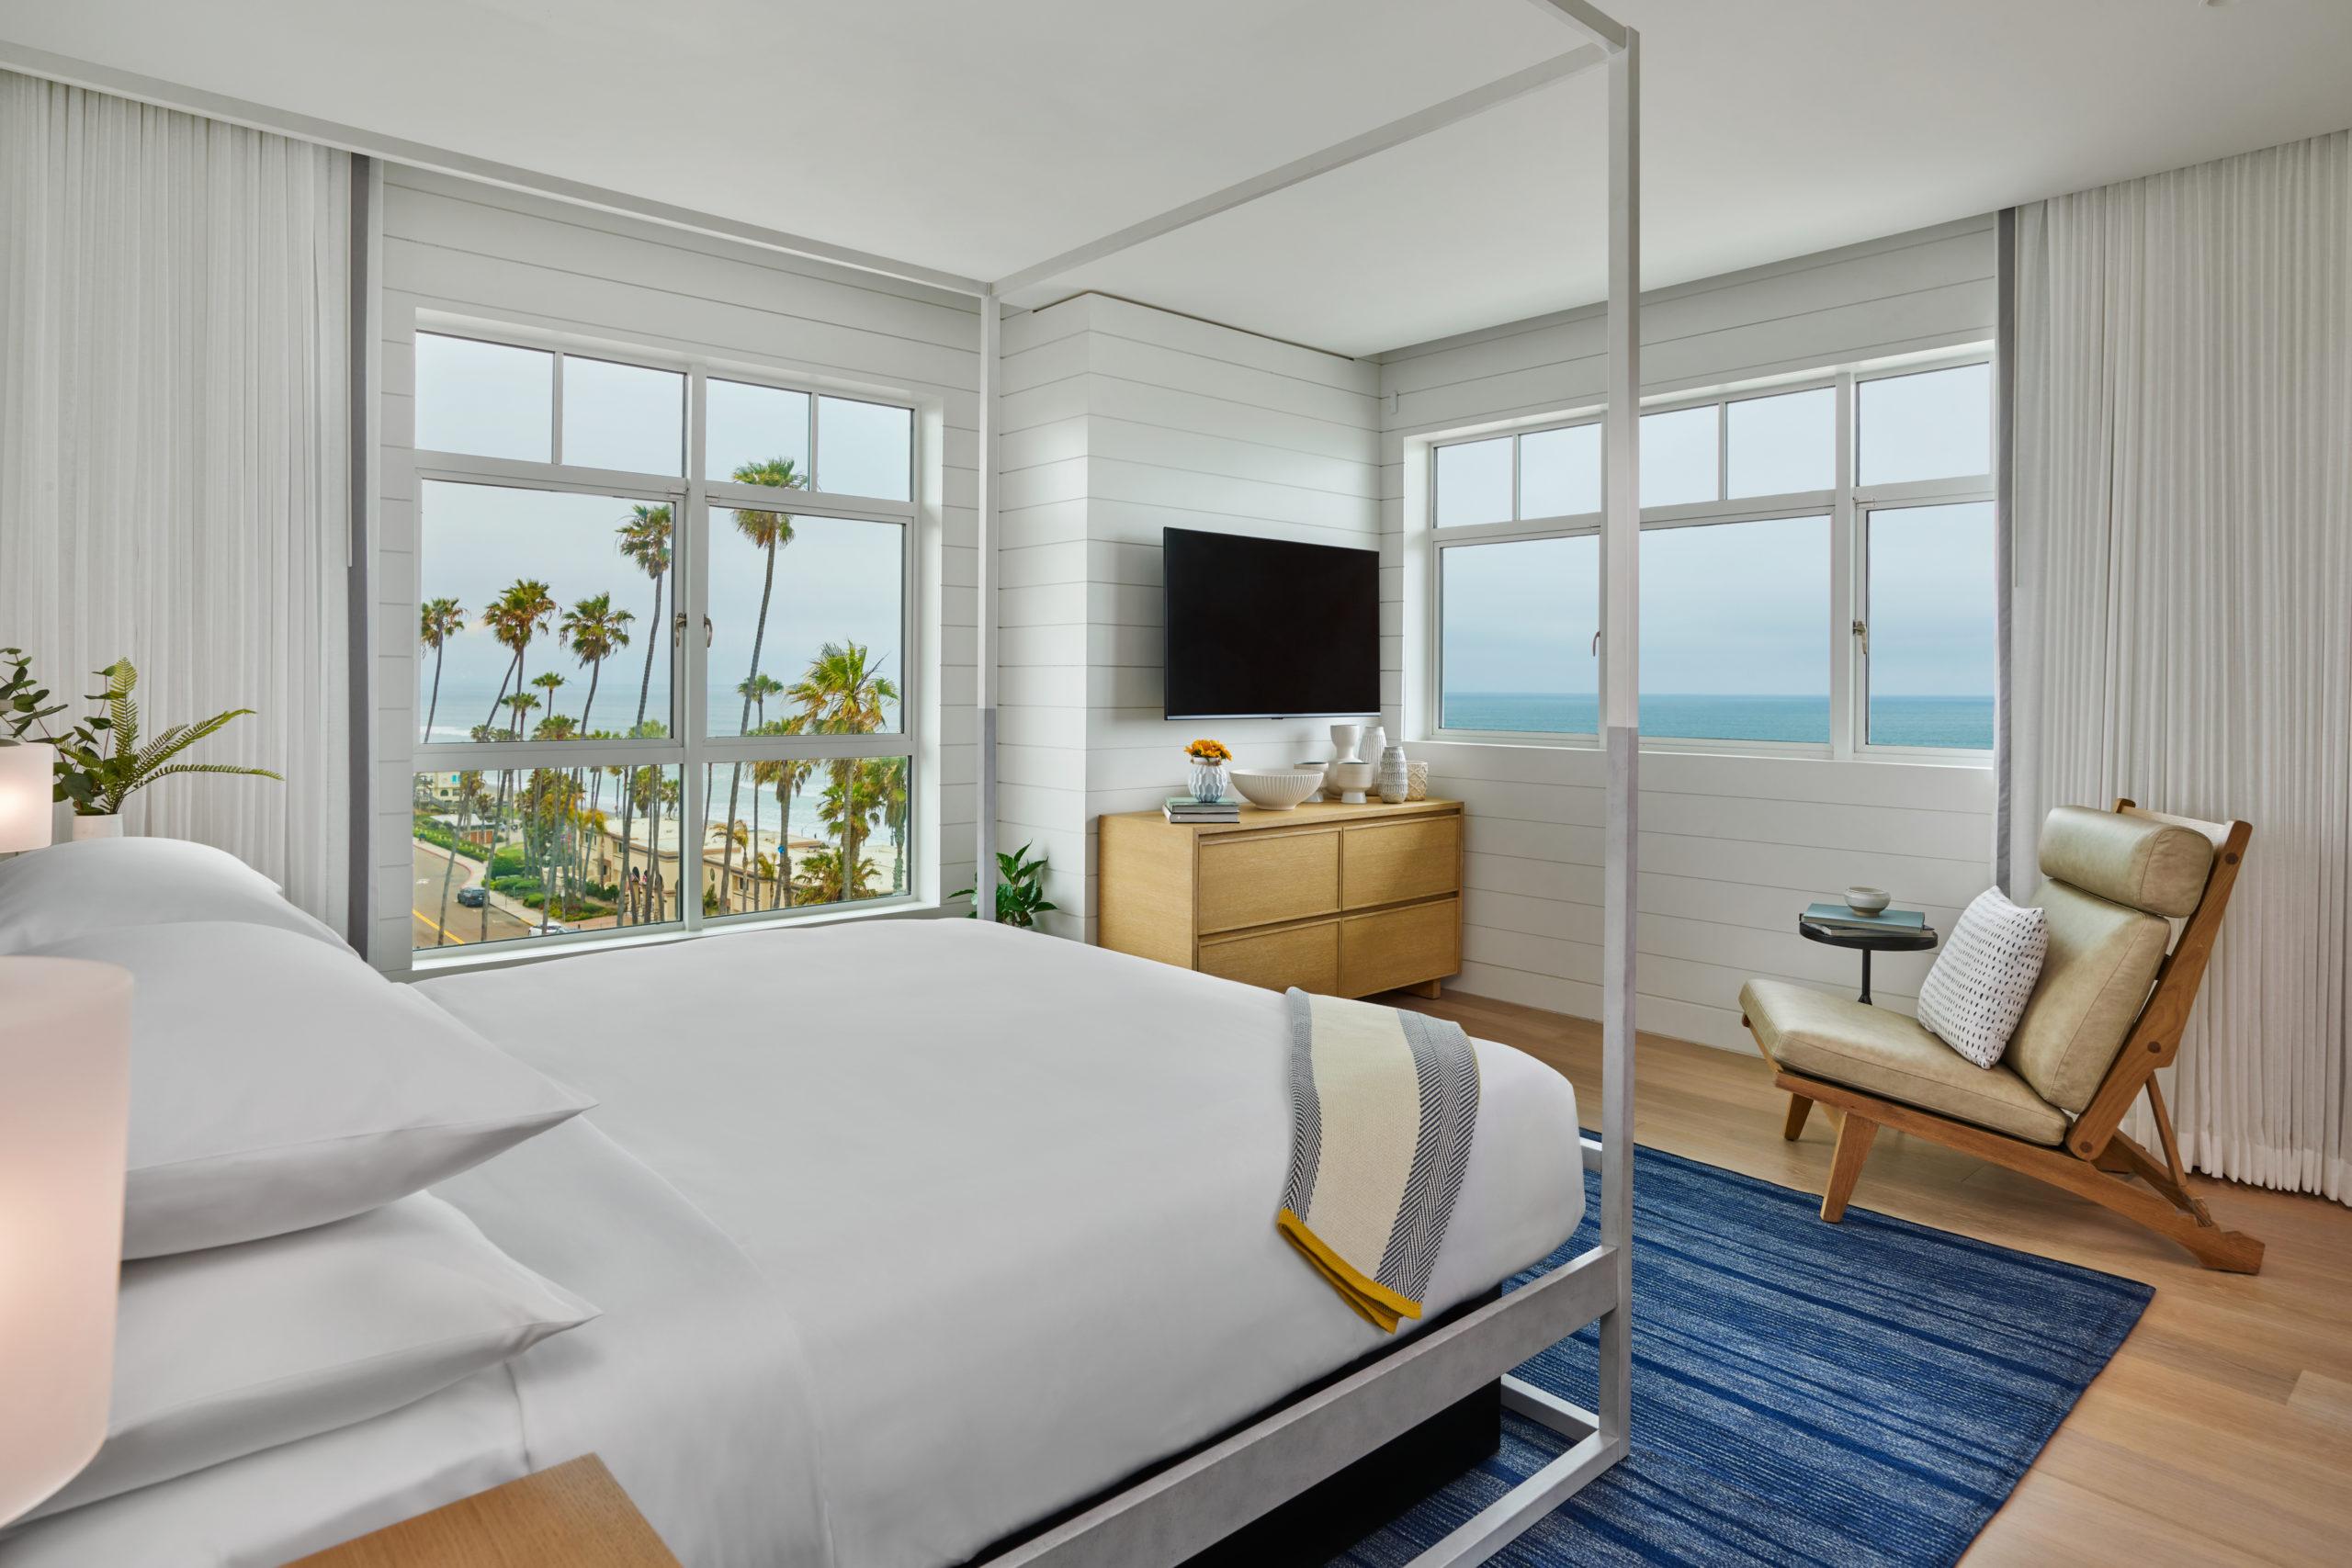 Bedroom Sando TV